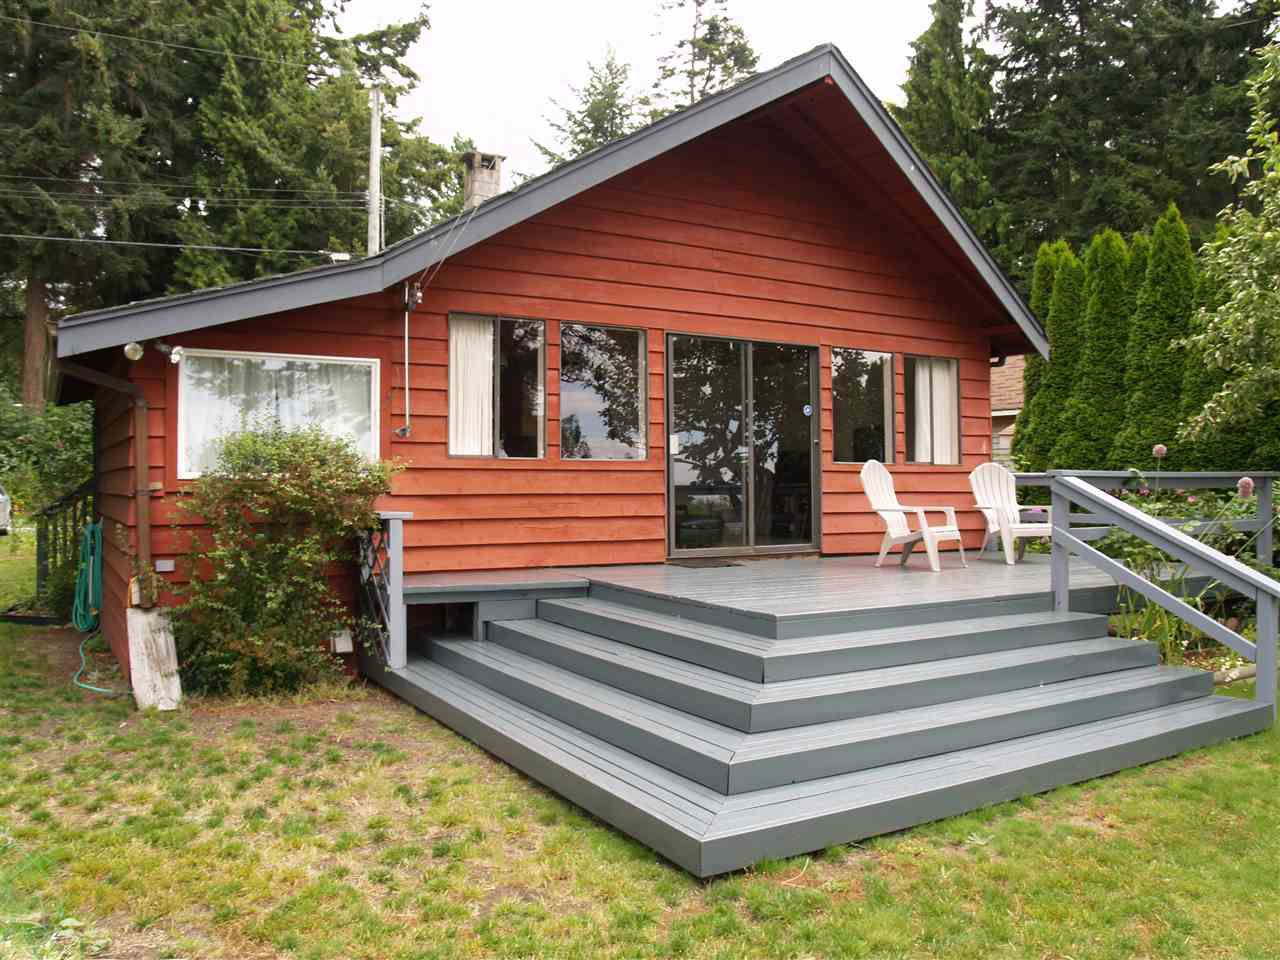 Beautiful low bank cottage on Stalashen drive just south of Davis bay on the Sunshine Coast.